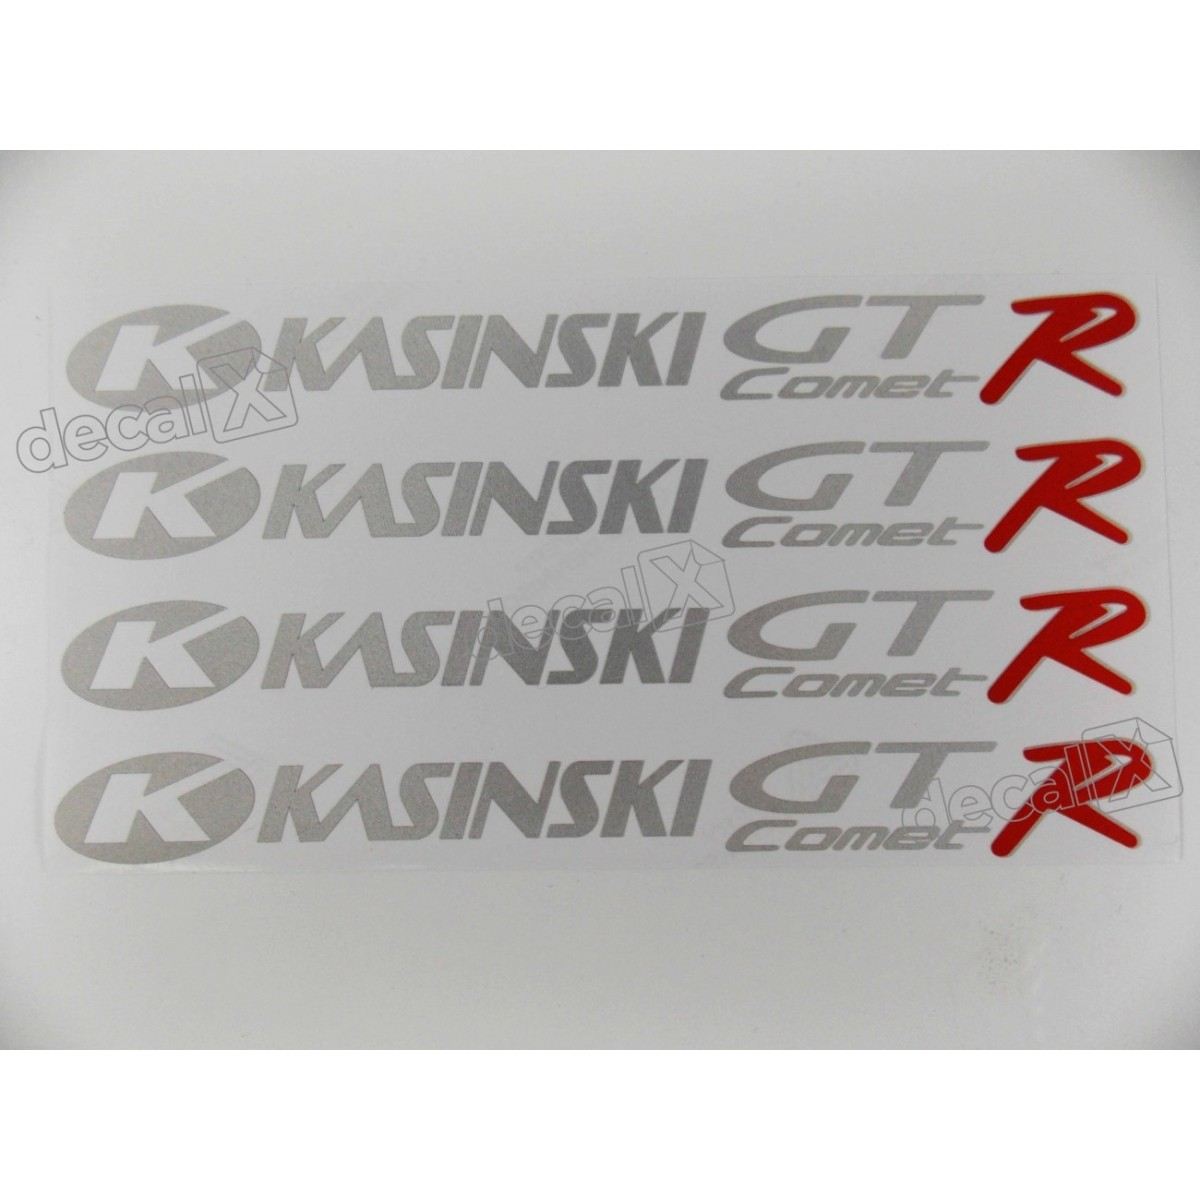 Adesivos Centro Roda Refletivo Moto Kasinski Comet Gtr Rd2